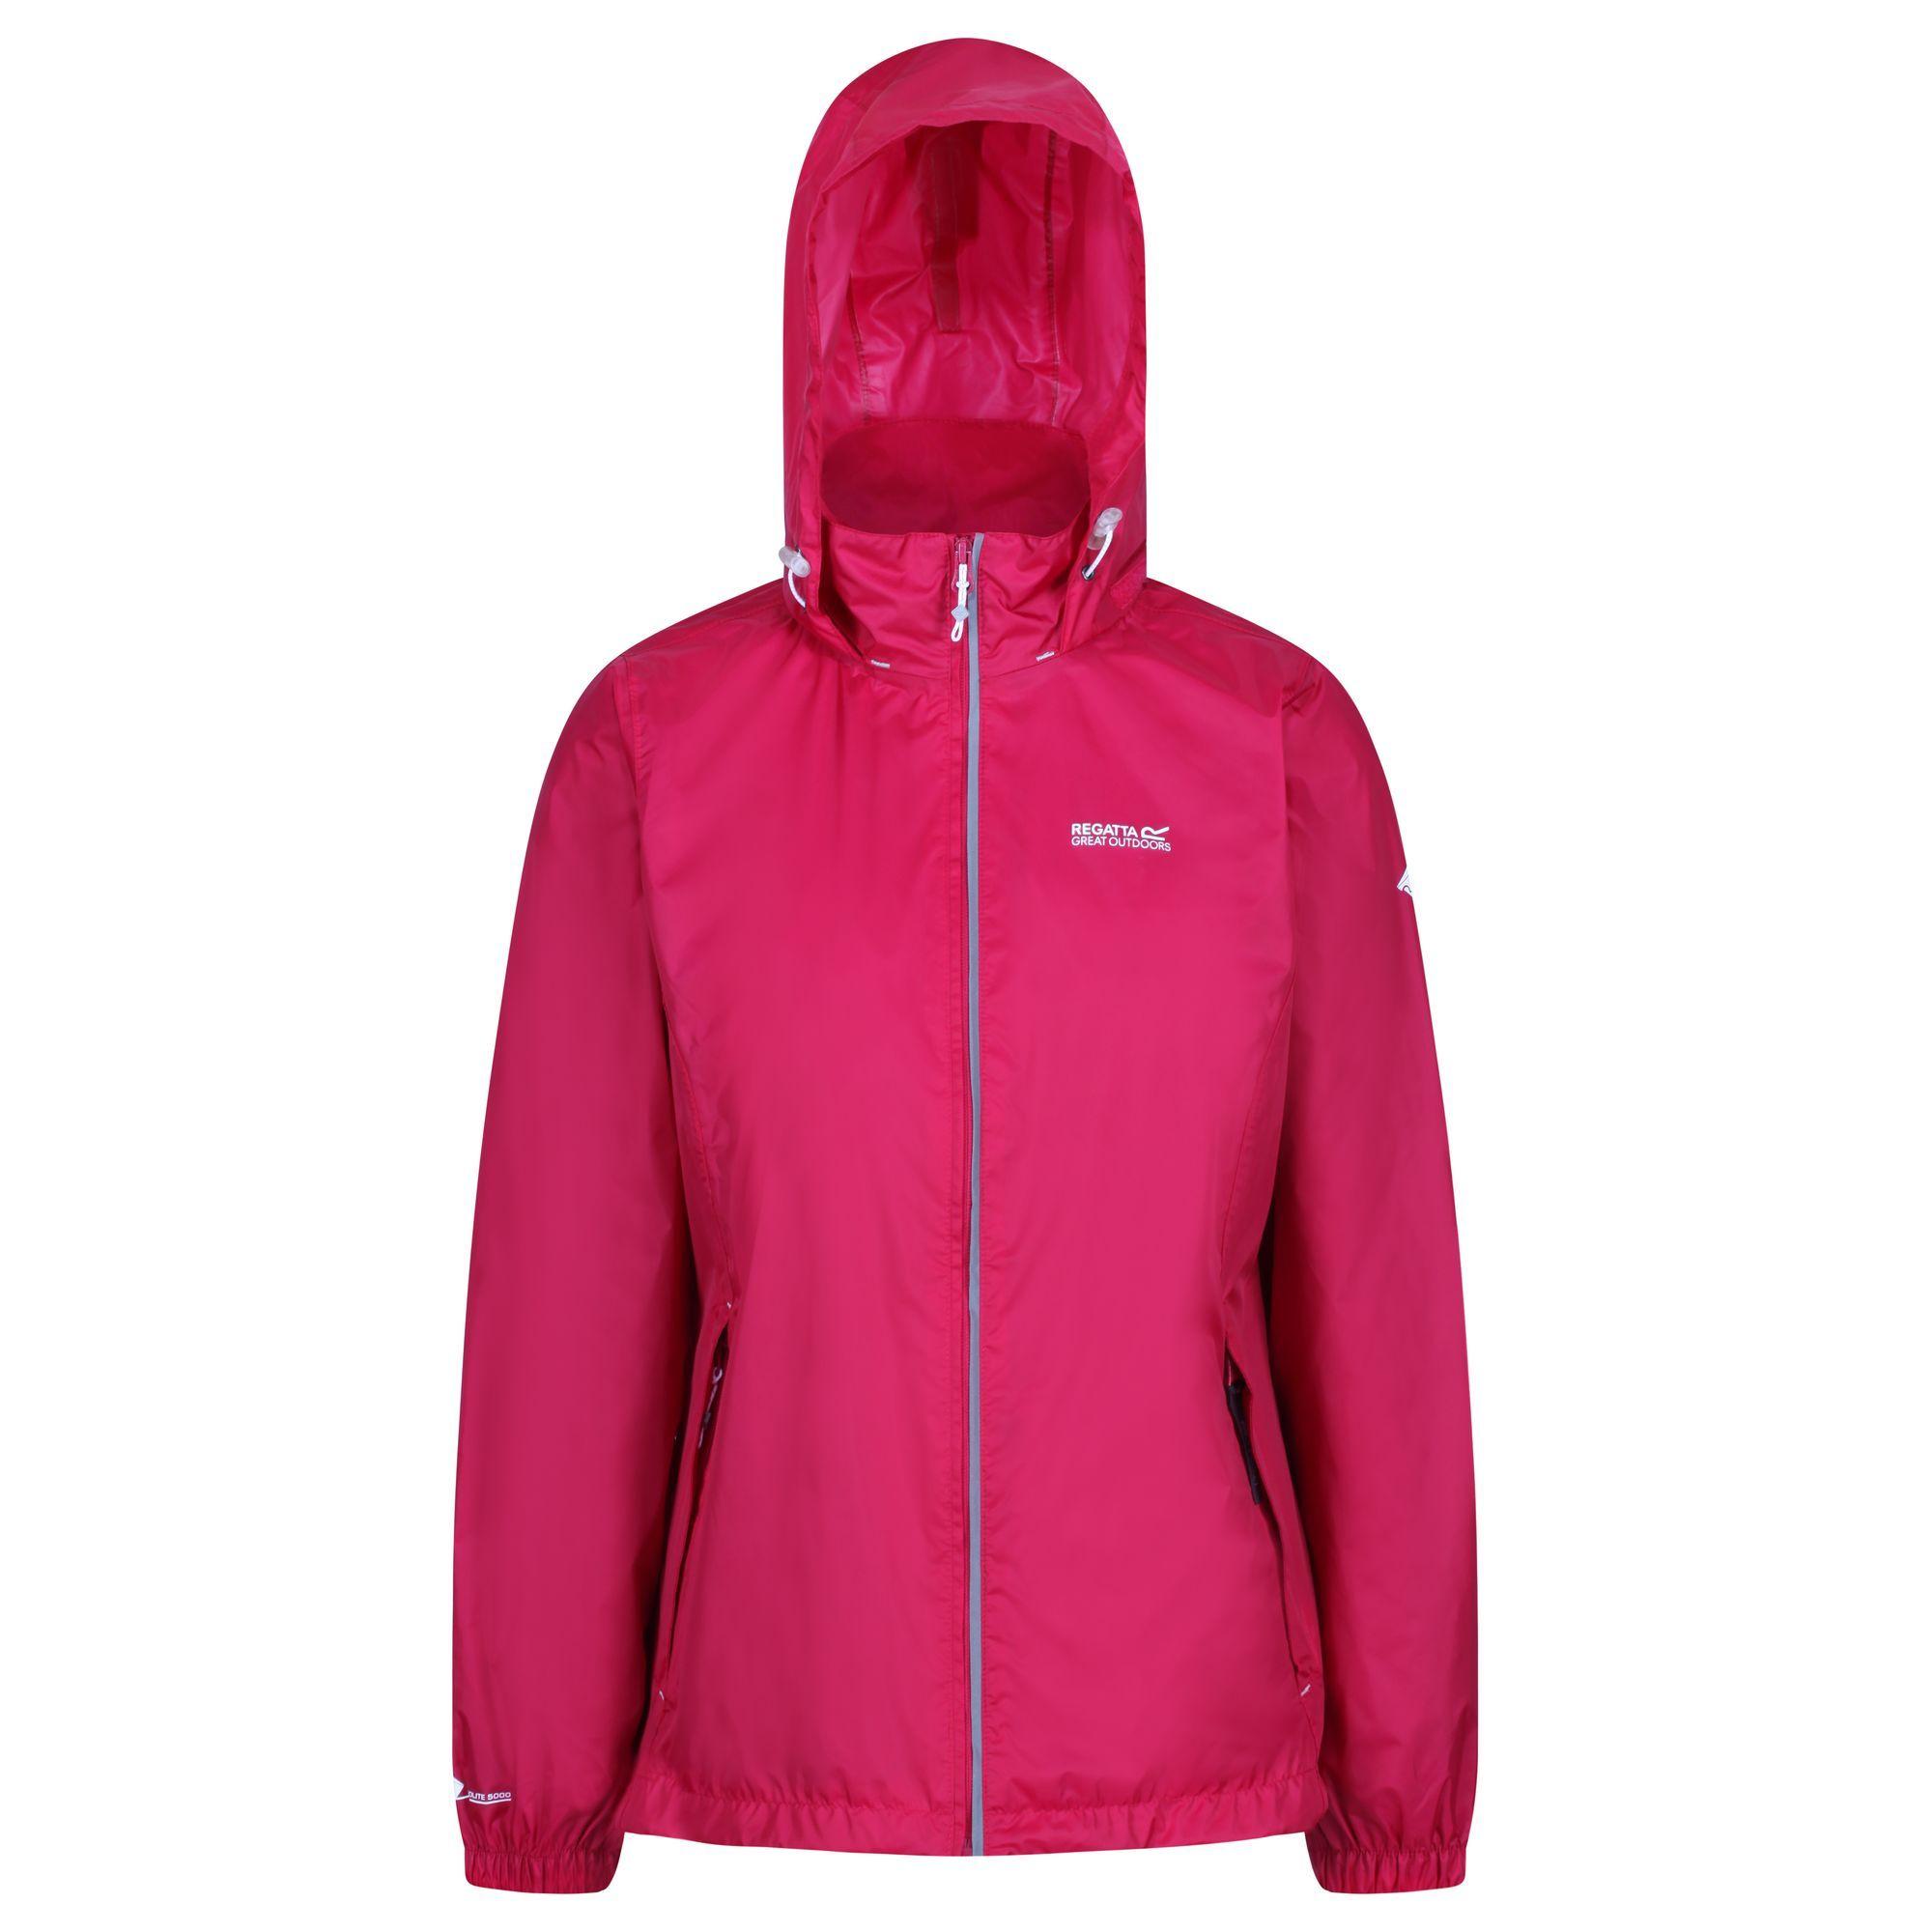 Regatta Women's Corinne IV Waterproof Softshell Jacket